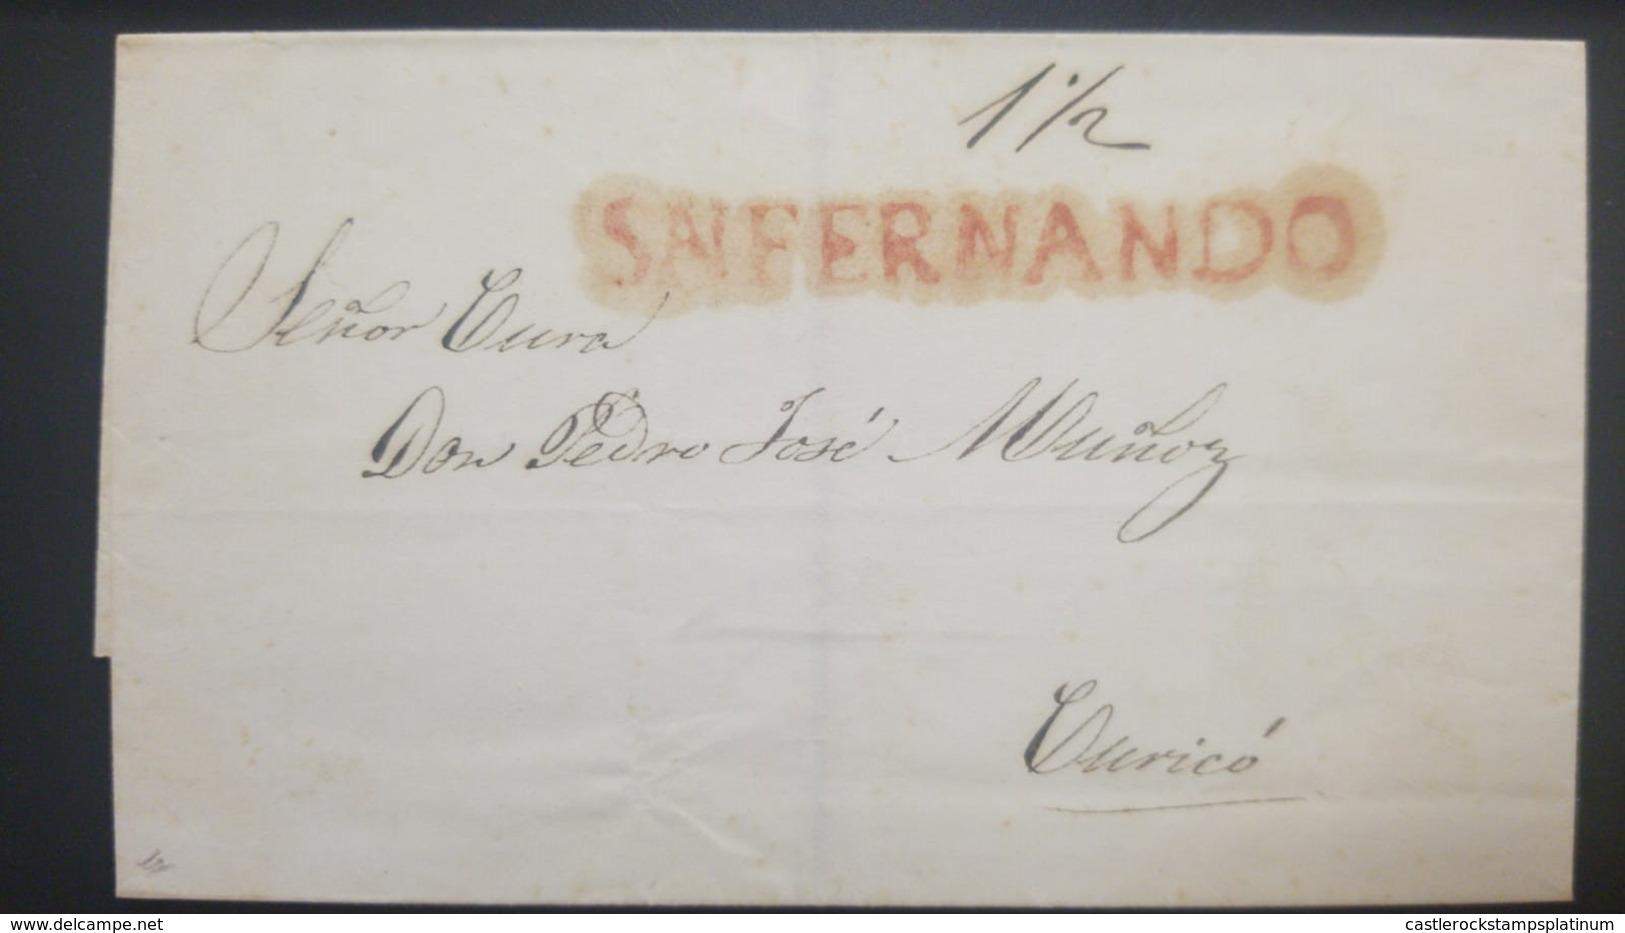 O) 1832 CHILE, PRESTAMP - PREPHILATELY, SN FERNANDO - RATED 1 1/2 REALES IN MANUSCRIPT, STRAIGHT LINE HANDSTAMP OF DESPA - Chile